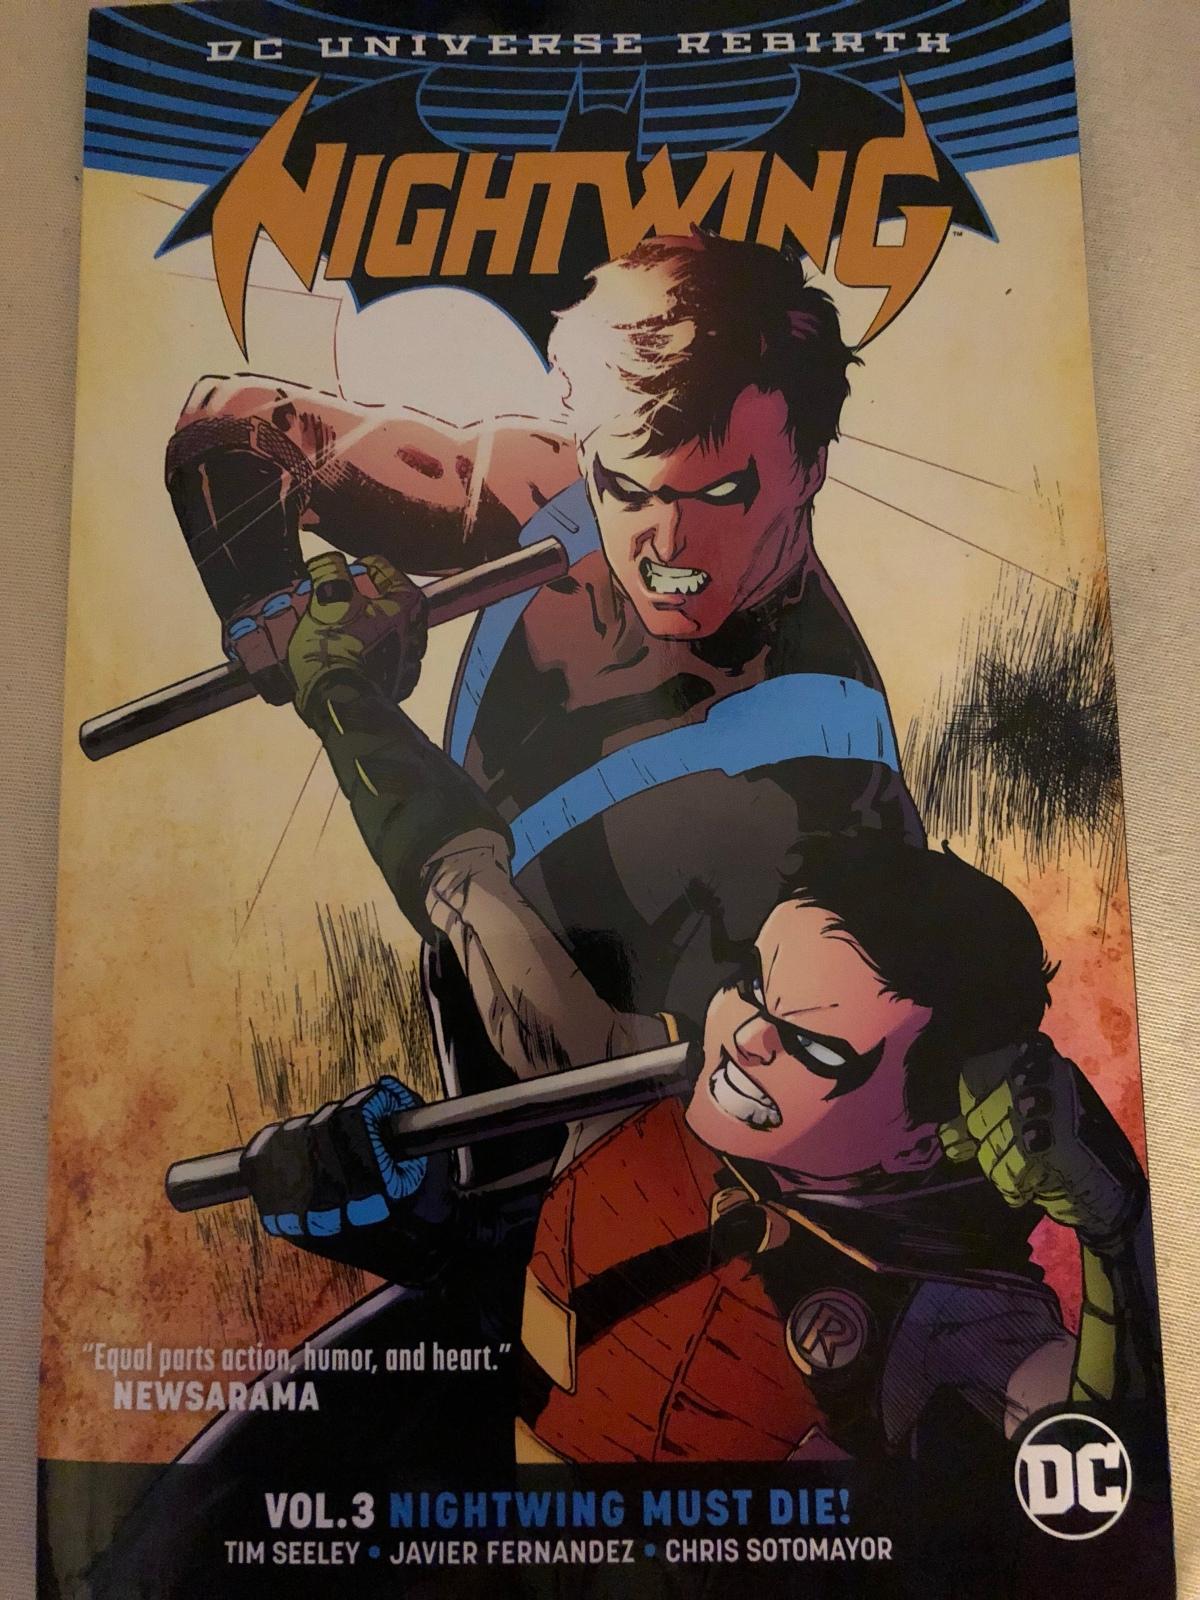 Nightwing Vol. 3: Nightwing must Die! (DC Rebirth) |Review